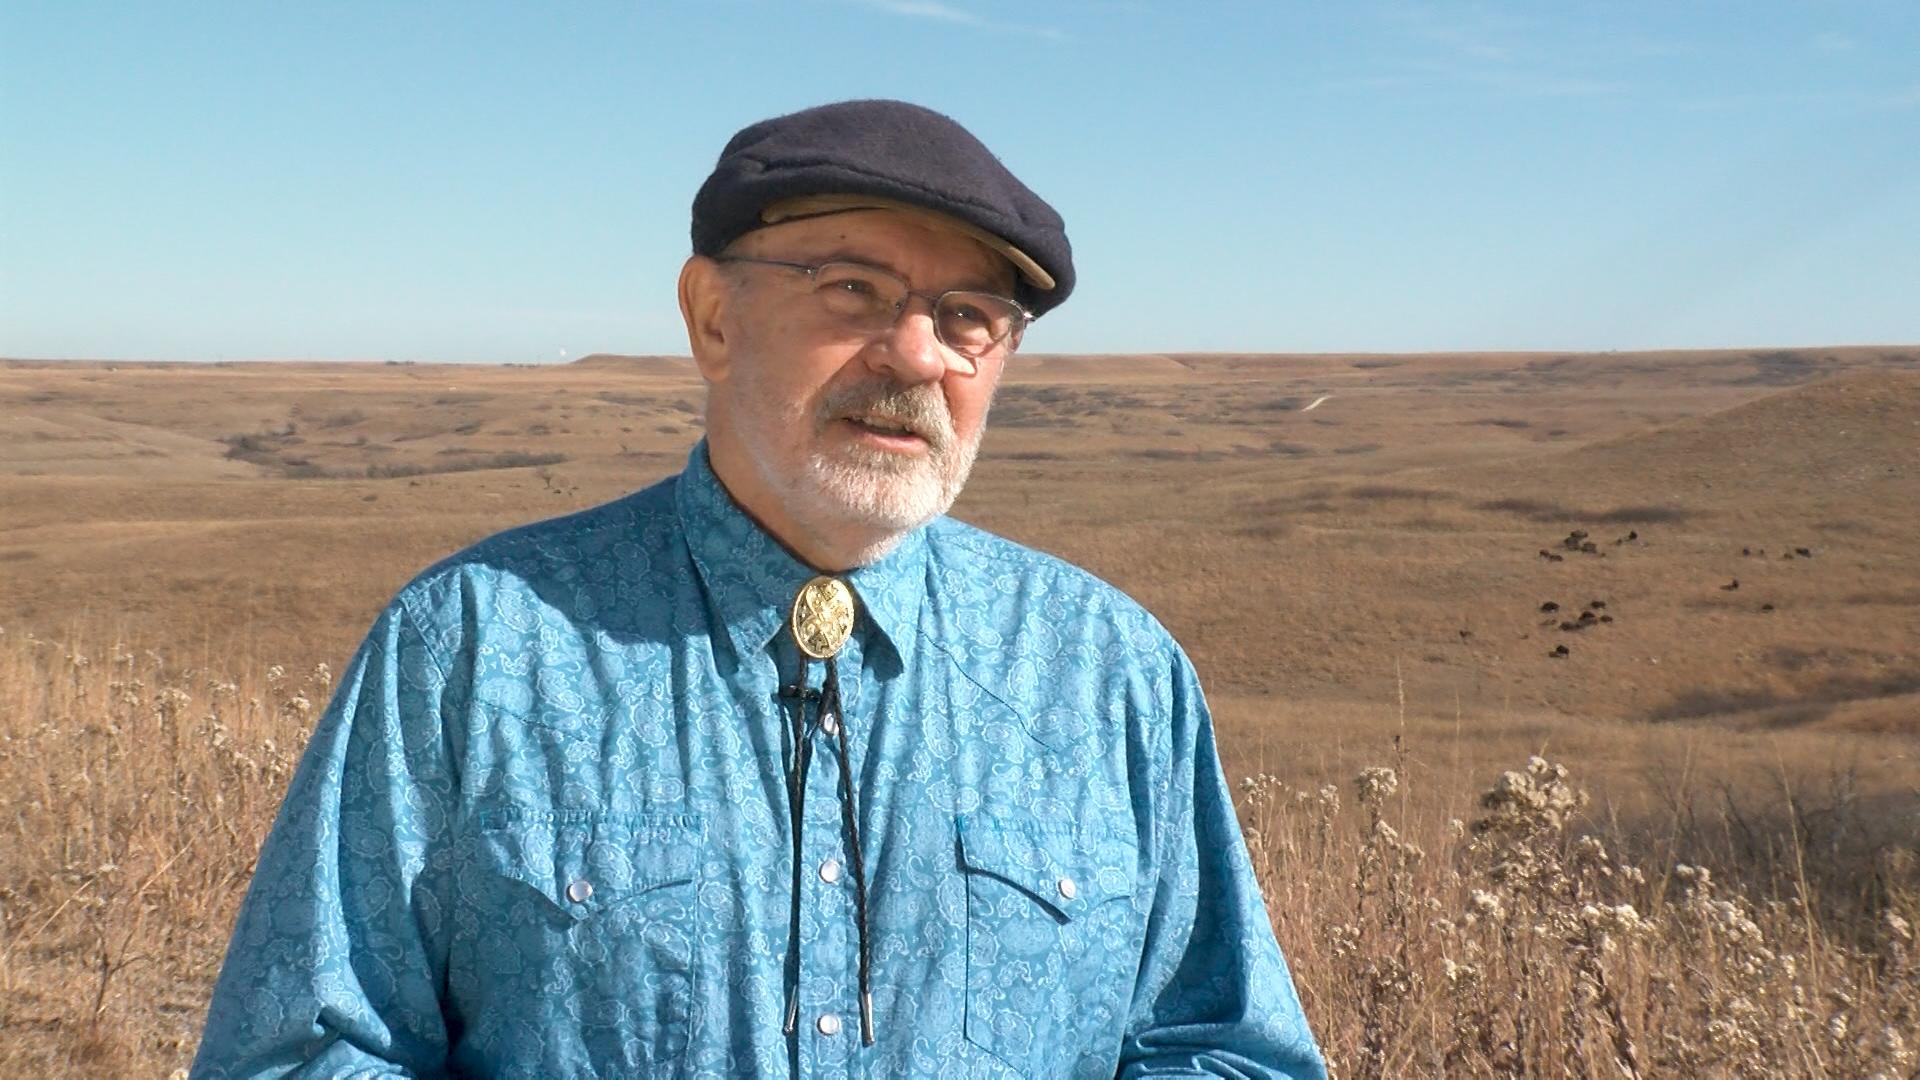 Historian Jim Sherow